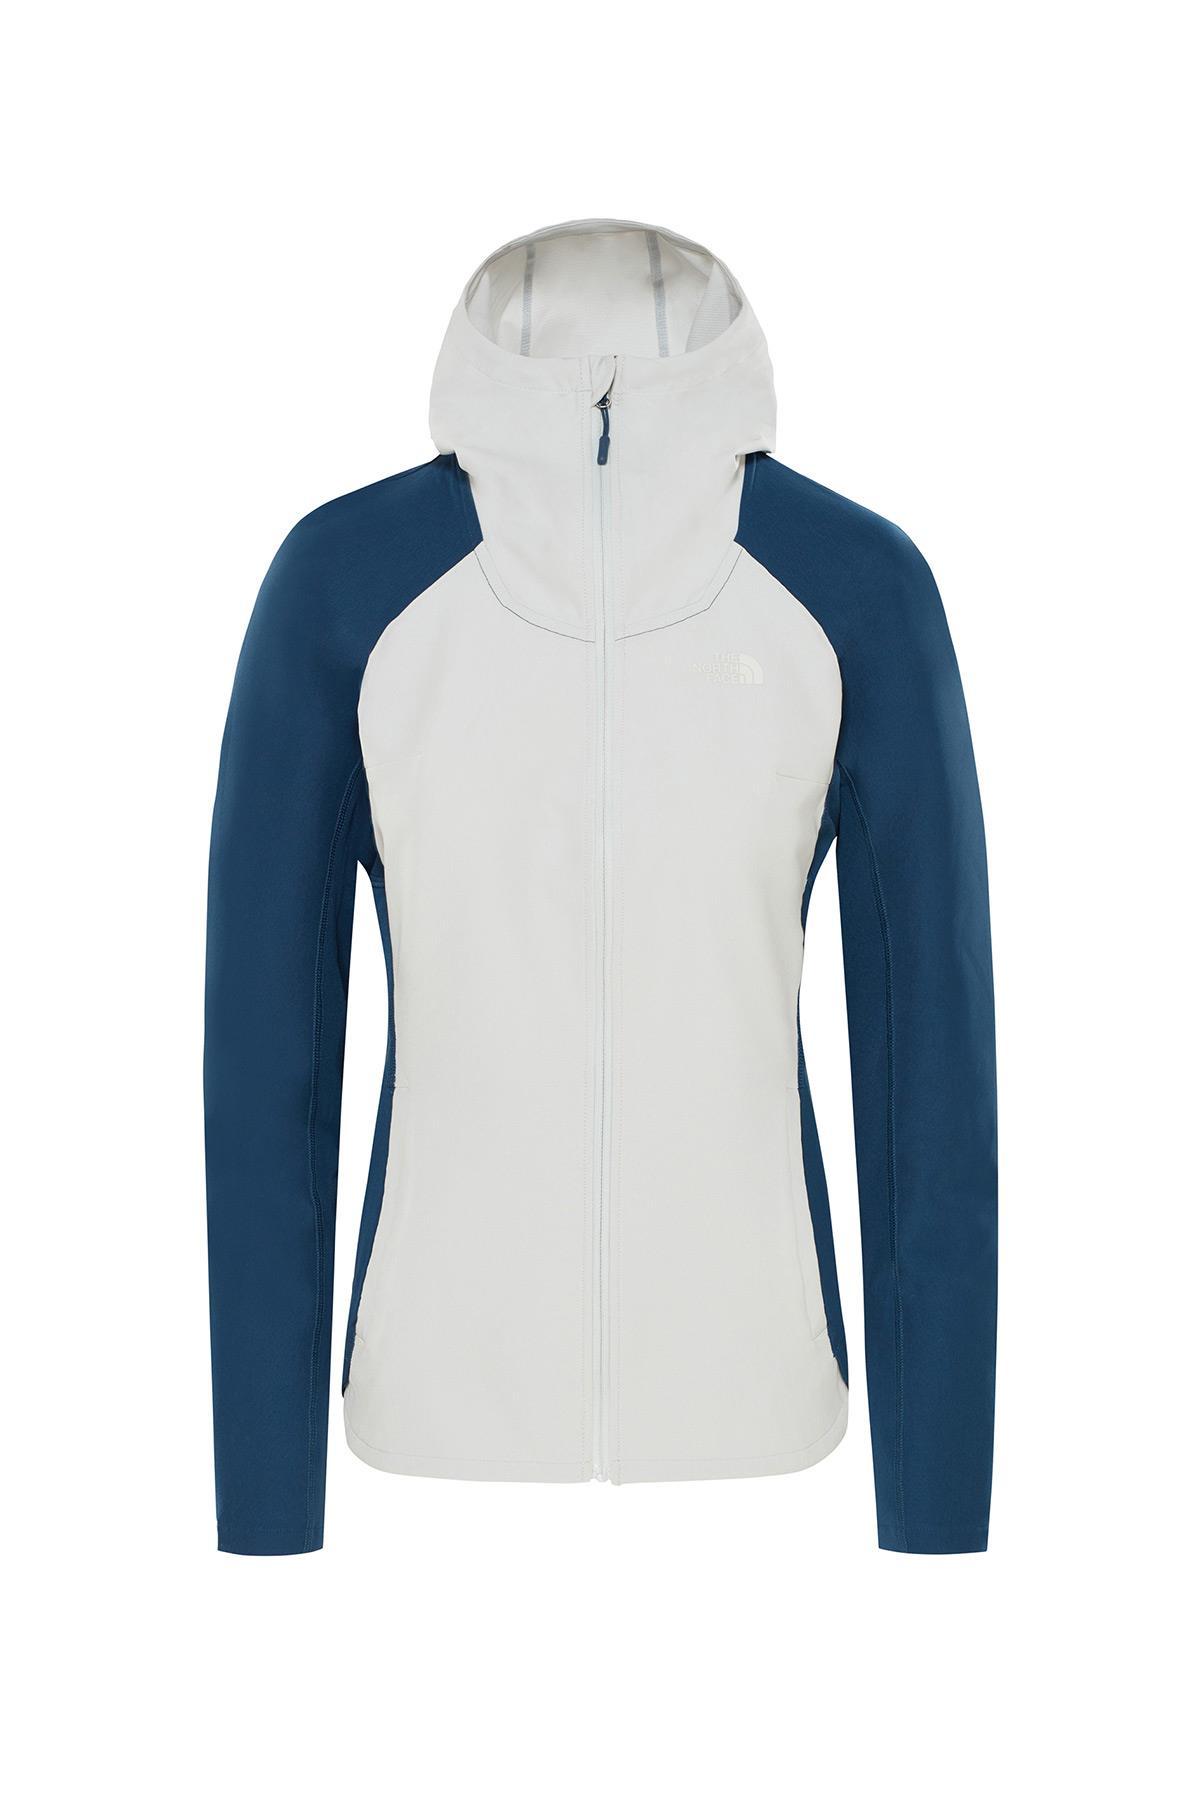 The Northface Kadın İnvene Softshell Jacket T93Ry3B99 Ceket